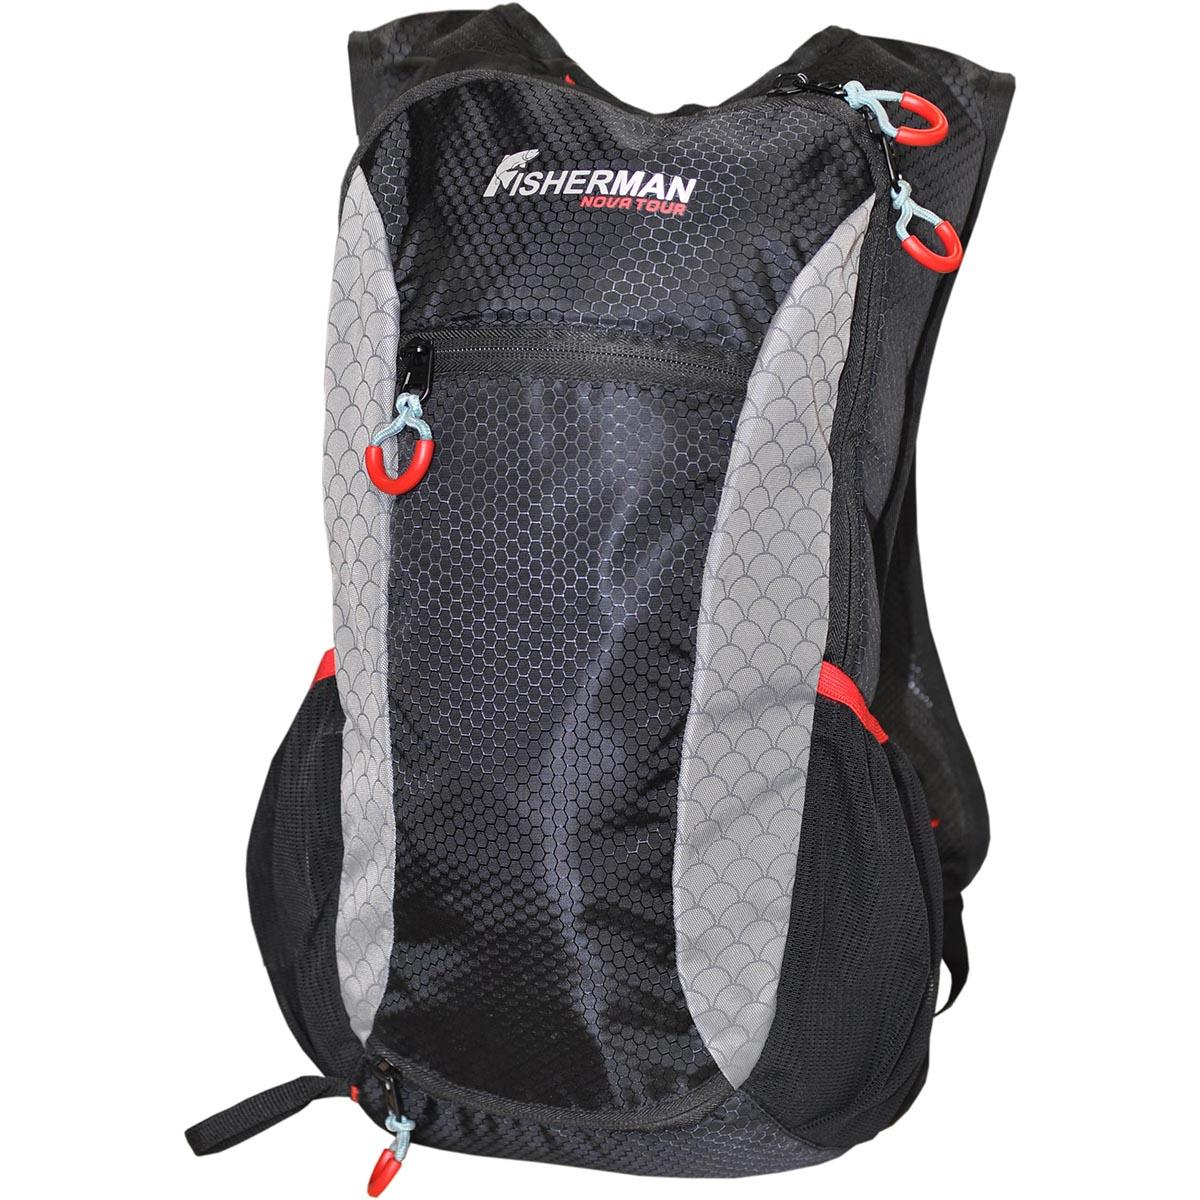 Рюкзак для рыбалки FisherMan Nova Tour Миноу PRO, цвет: черный, серый, 9 л коробка для уравнивания потенциалов hegel оп 100х100х50 ip55 куп2604 и